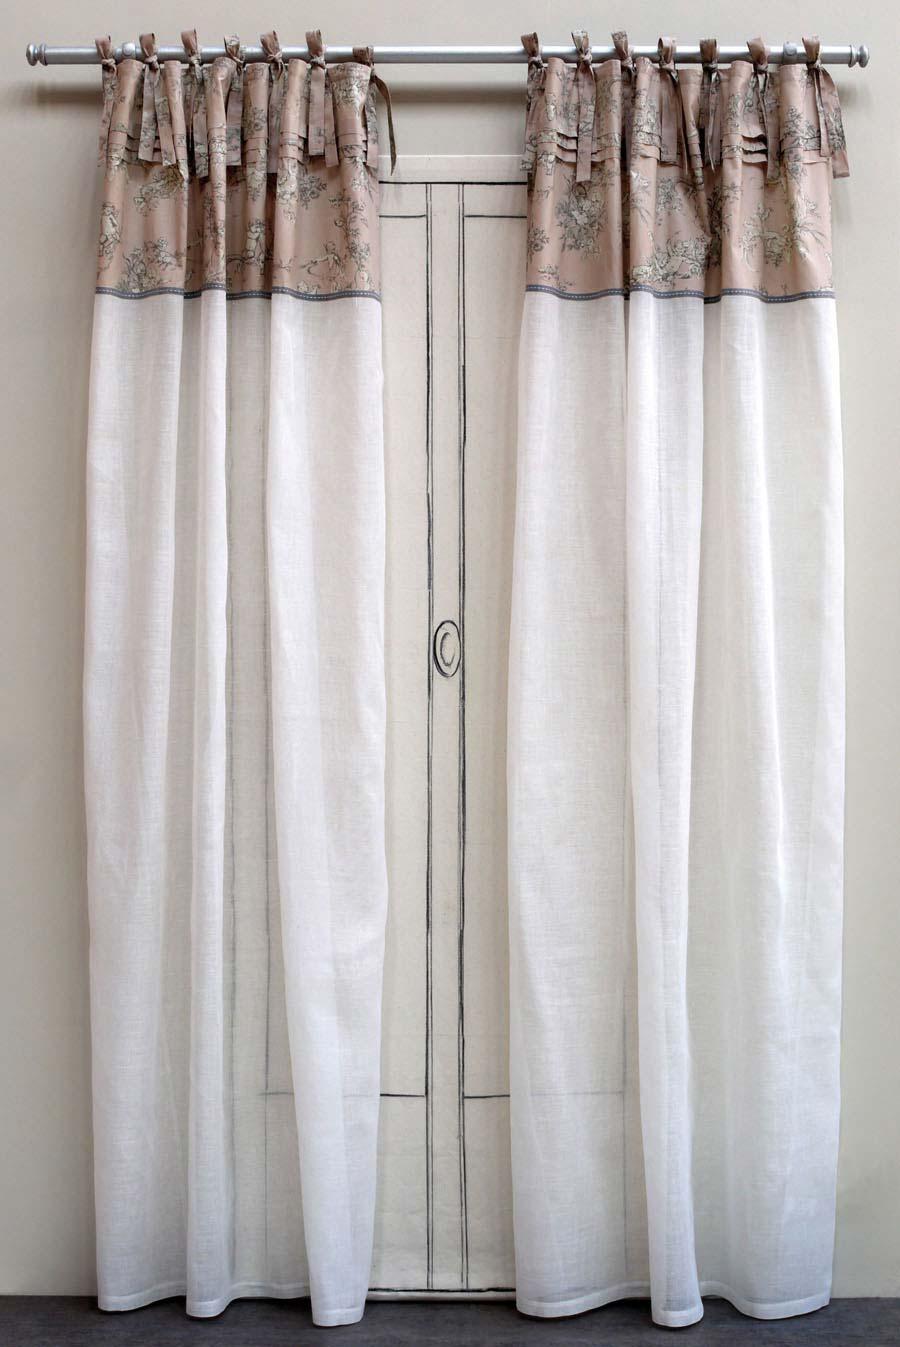 voilage en coton et lin 140x250 blanc interior 39 s. Black Bedroom Furniture Sets. Home Design Ideas